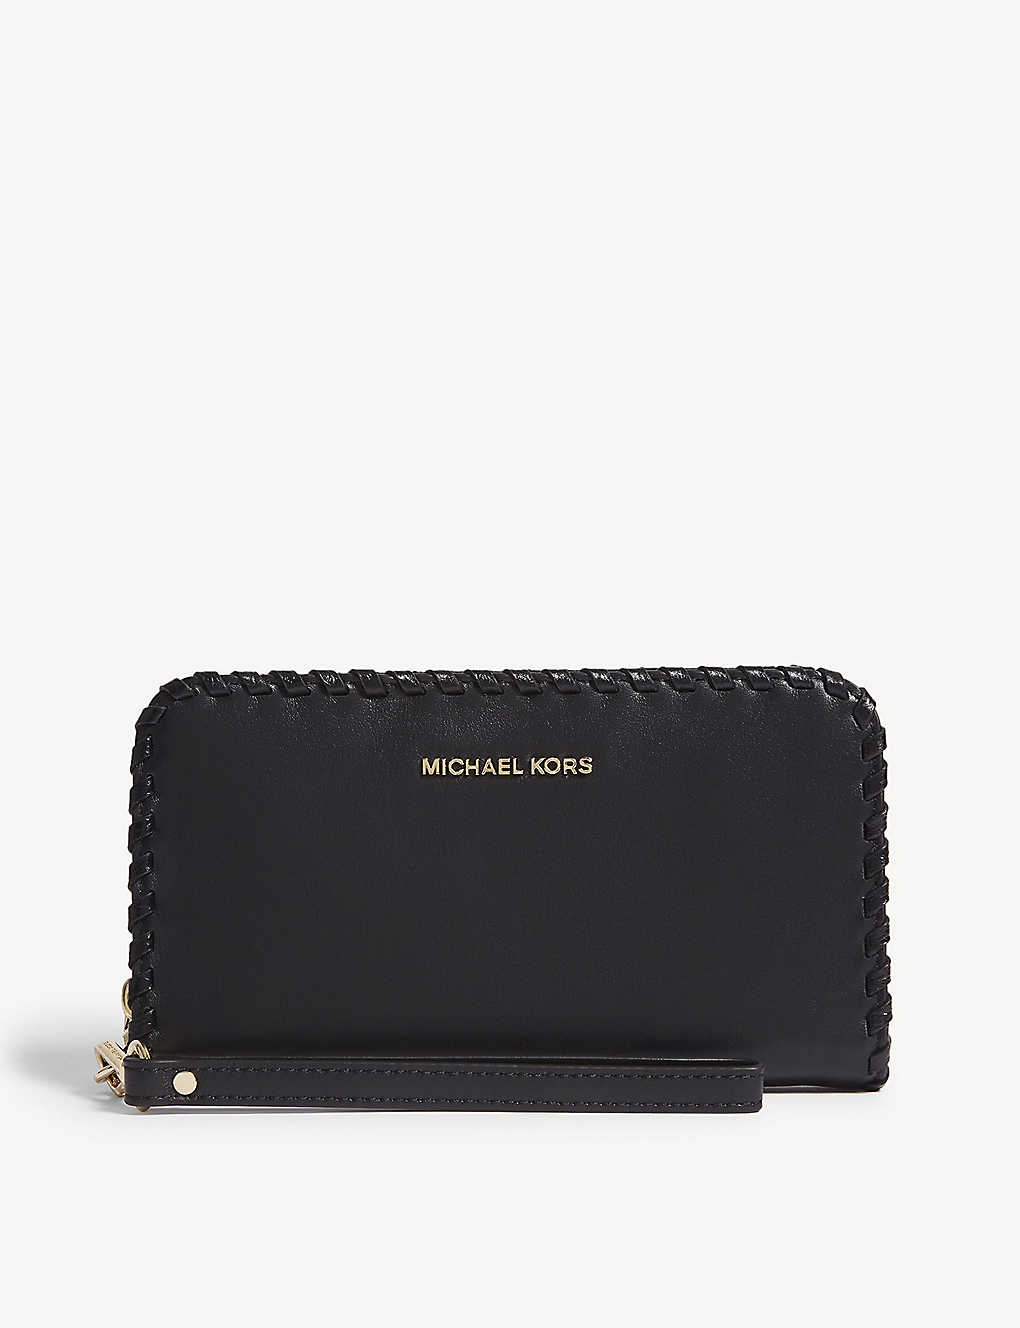 MICHAEL MICHAEL KORS - Whipstitch leather wristlet wallet ... 03af8685e0